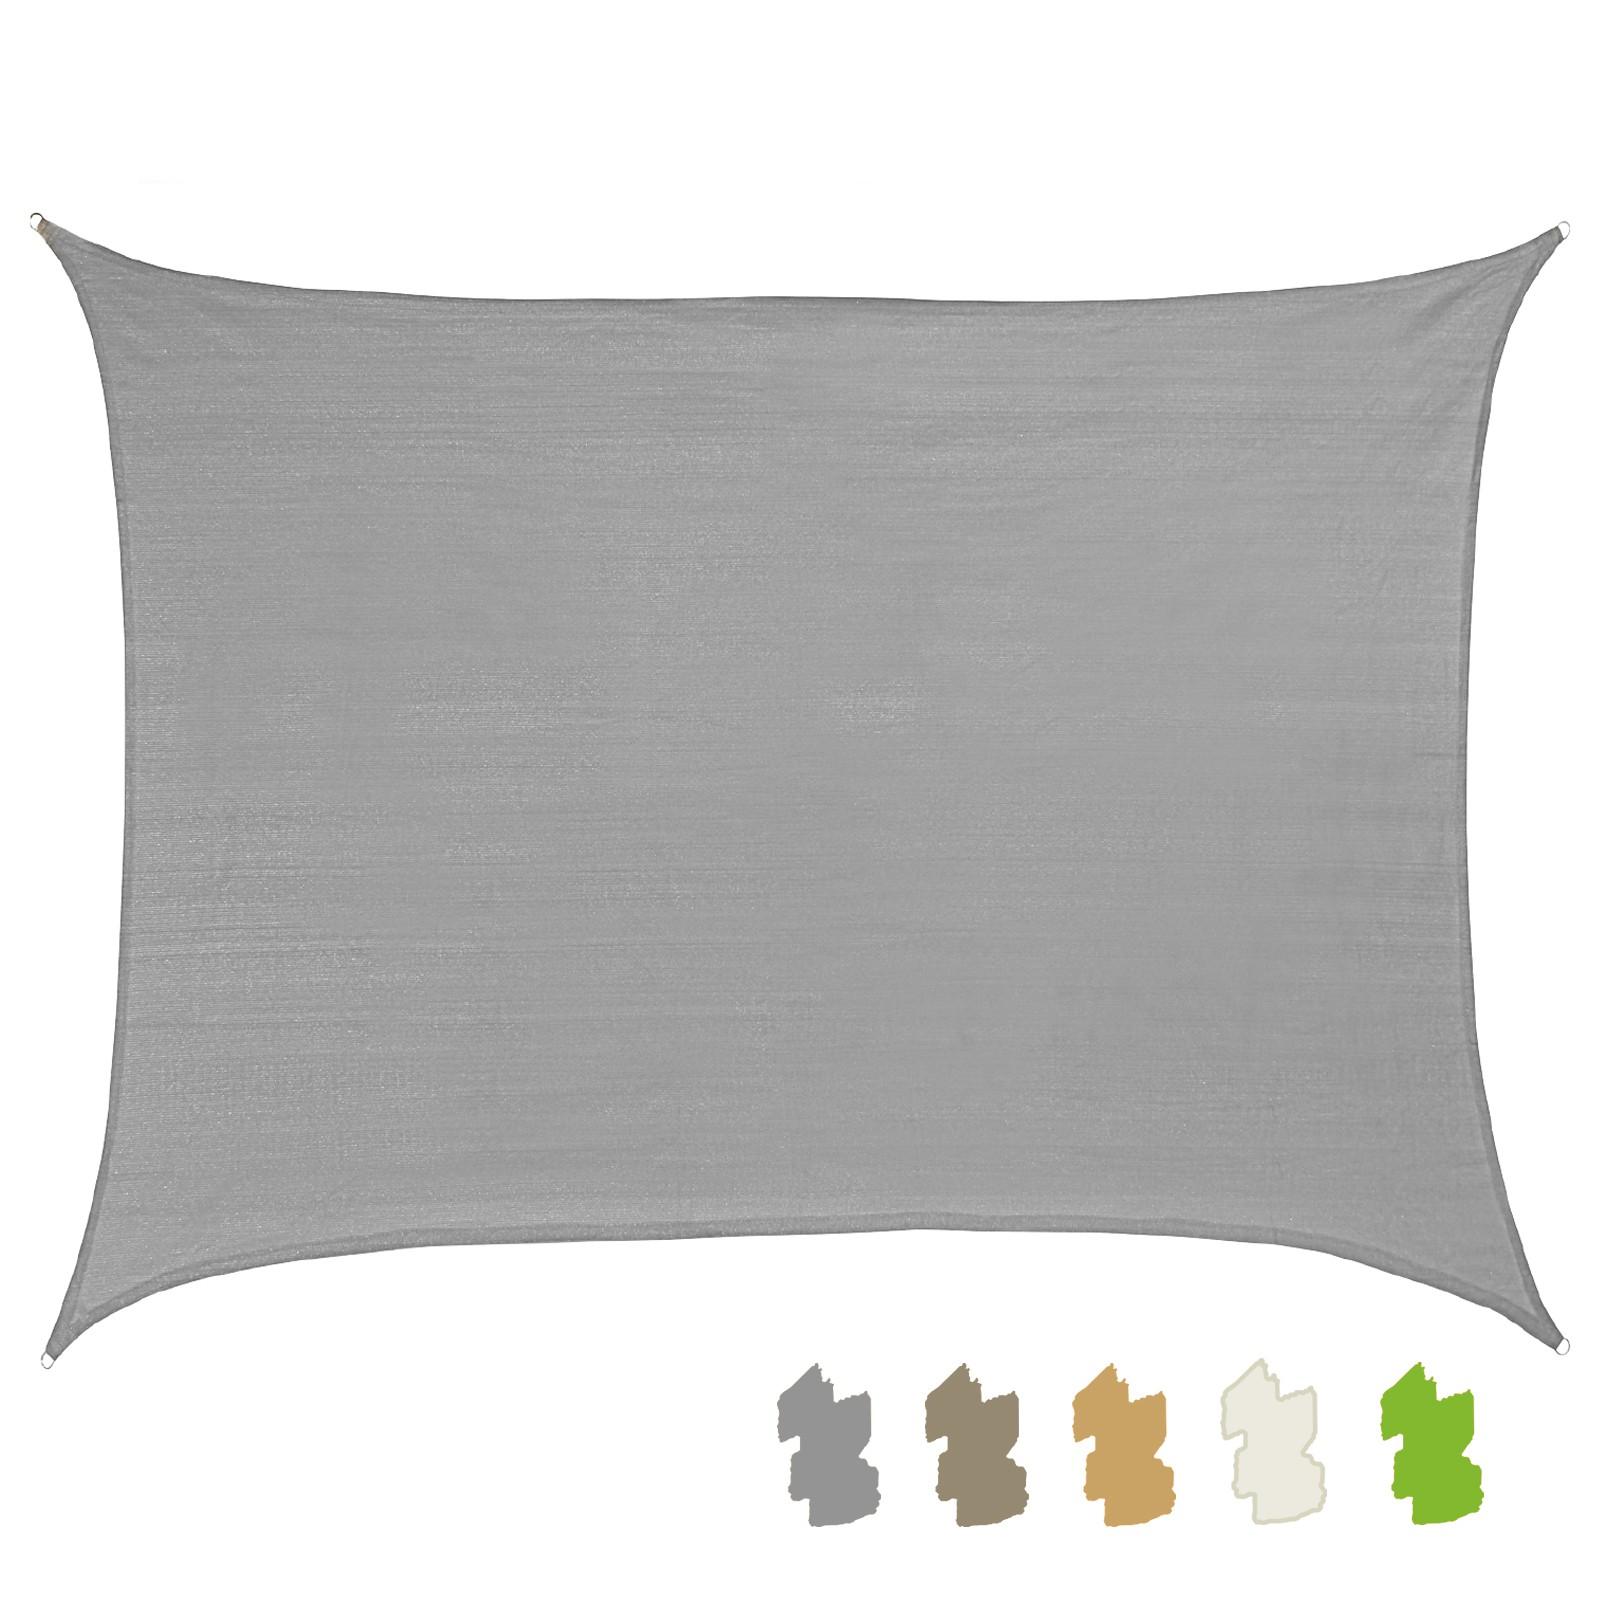 el toldo sun francis rectangular 3 x 4 m 100 hdpe colores diferentes por ventus. Black Bedroom Furniture Sets. Home Design Ideas